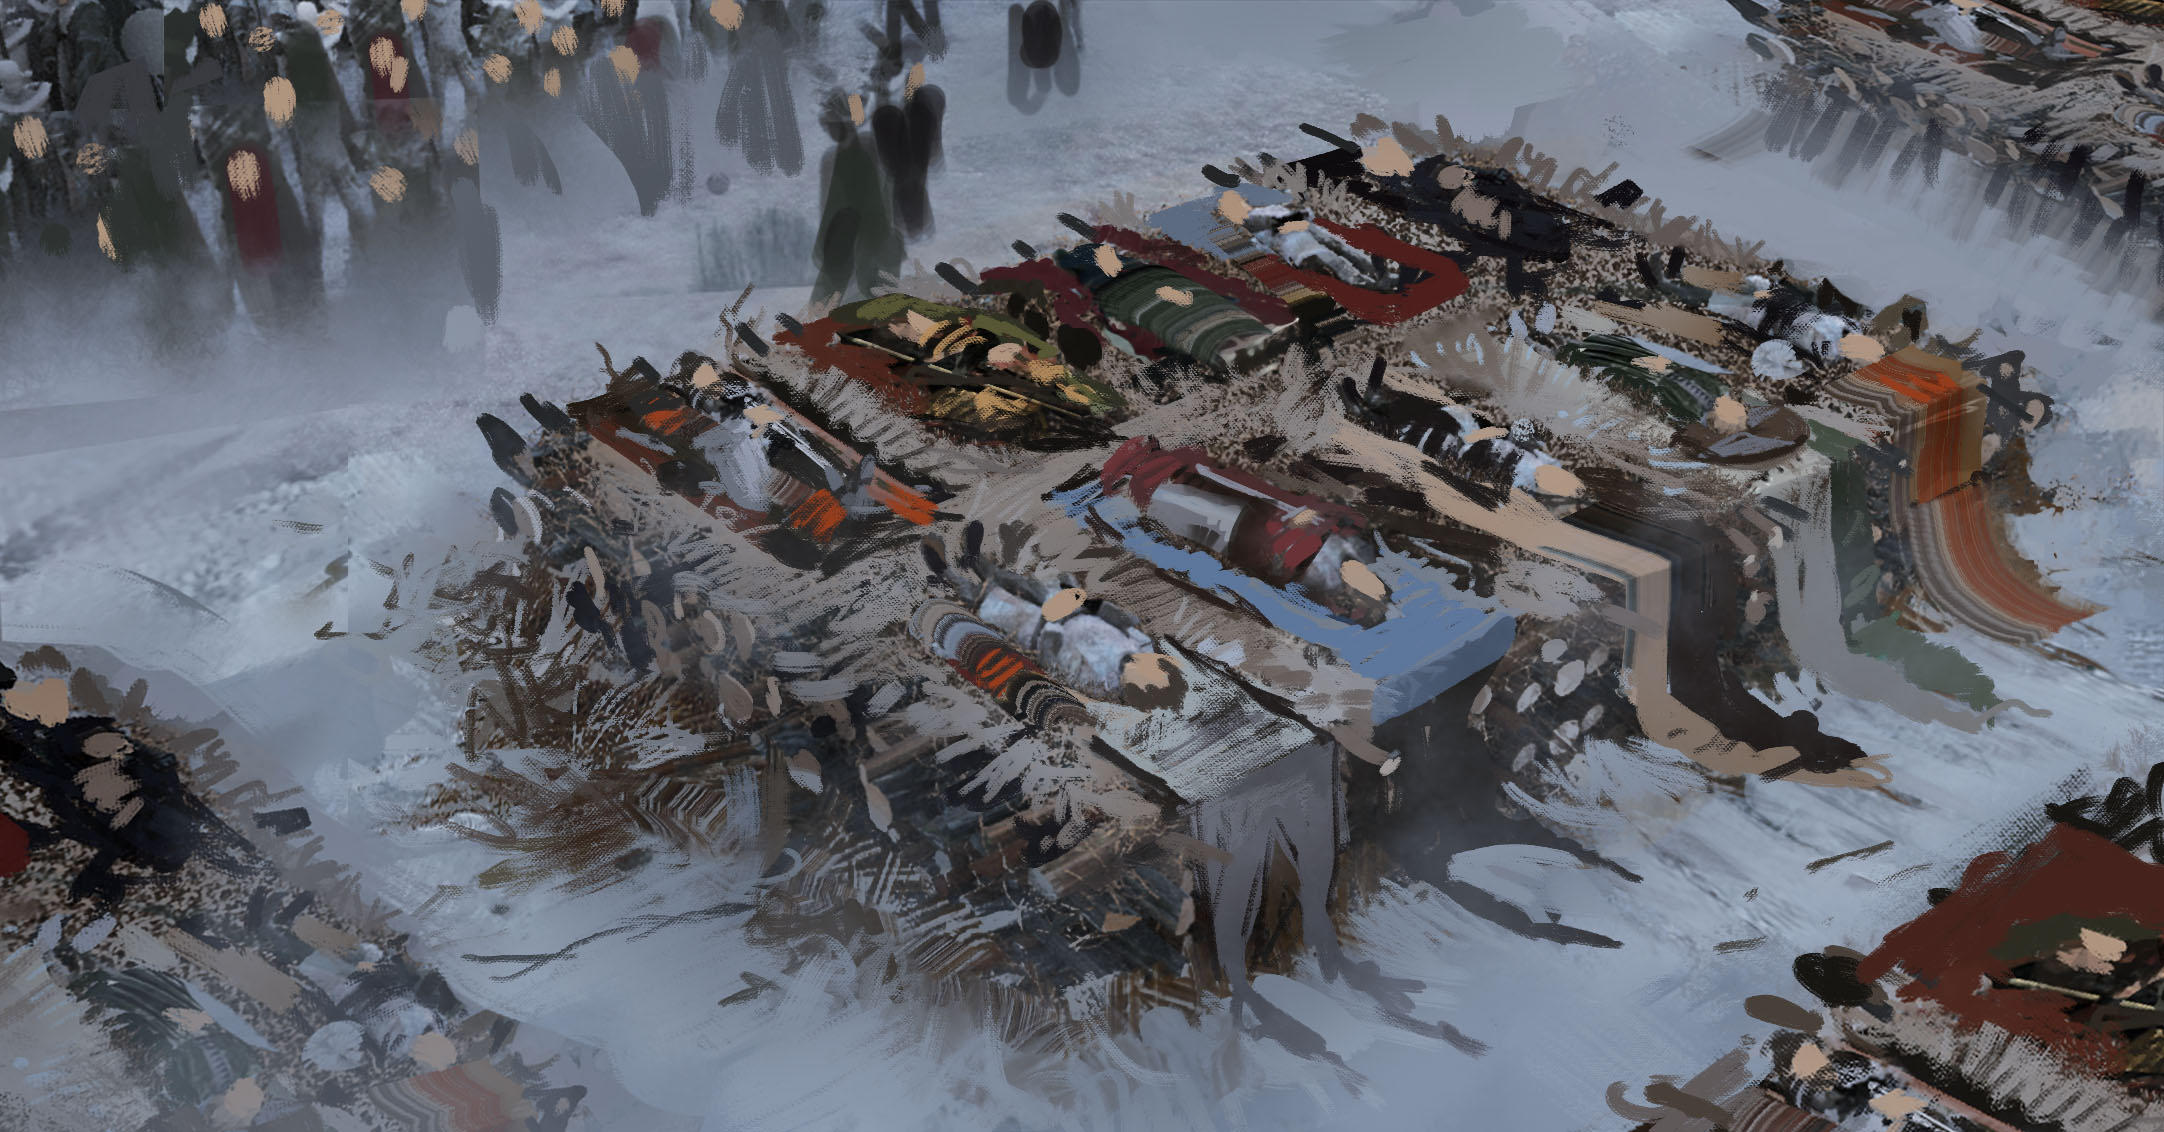 Winterfell_Funeral_Pyres_skt_007_ps.jpg